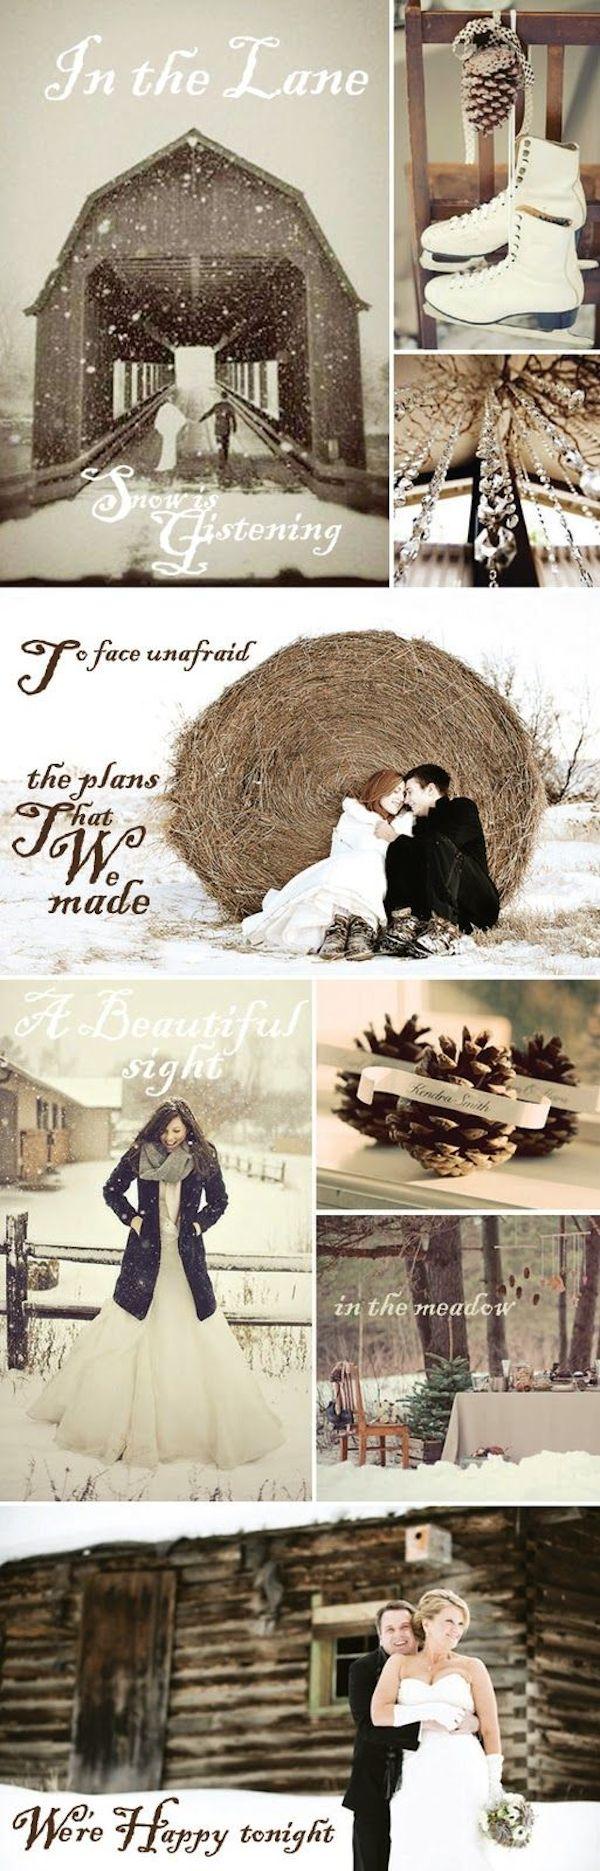 winter-wedding-ideas-vintage-winter-wedding-20